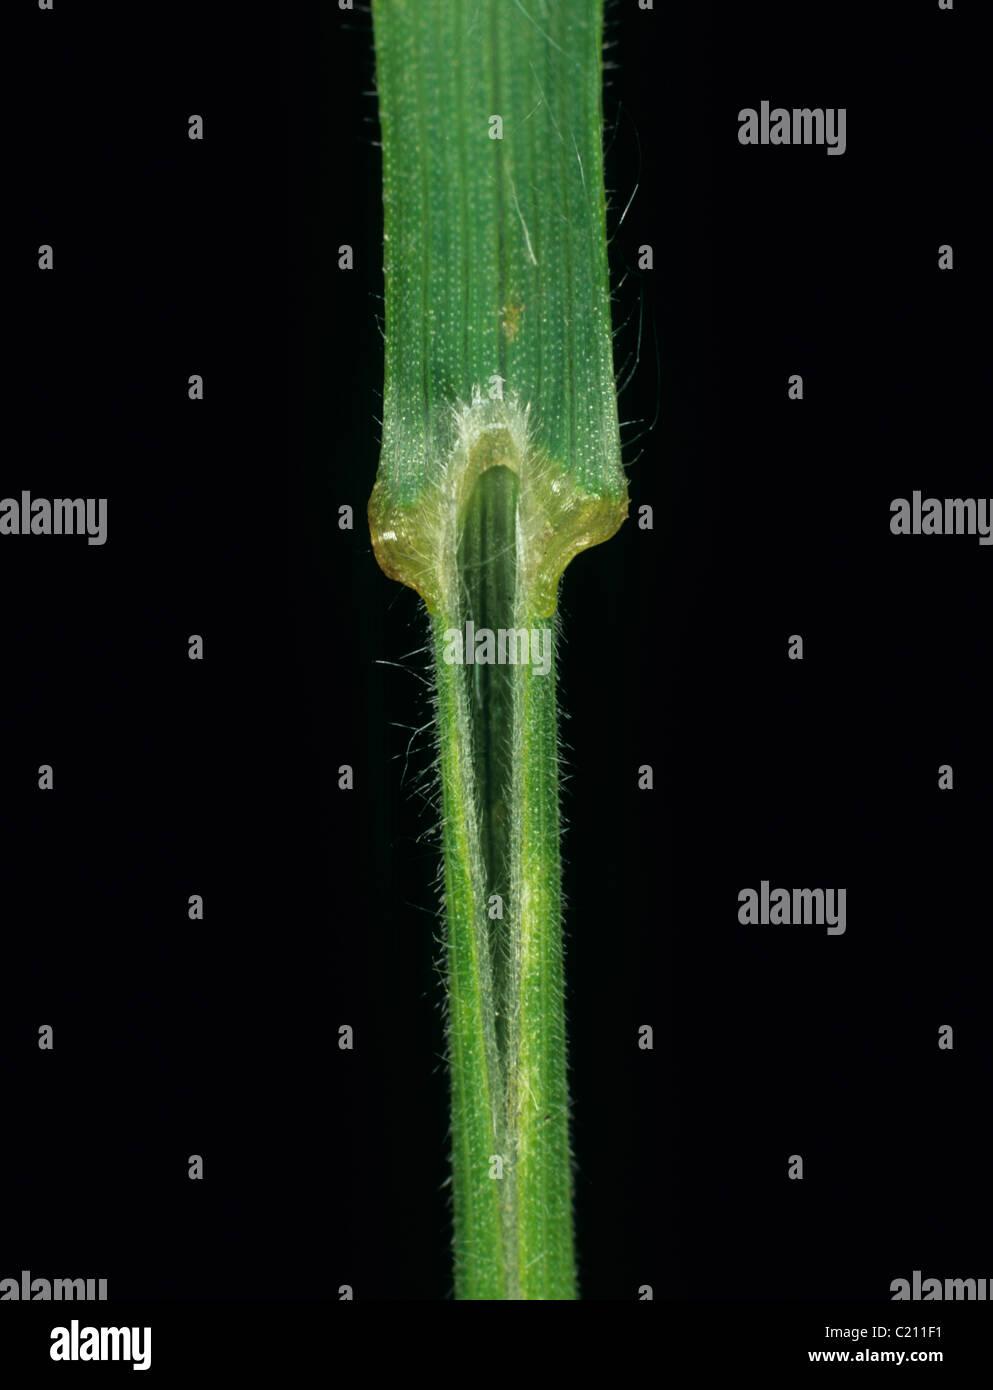 Weiche Brome Bromus Mollis grass Blatt Blatthäutchen Stockbild